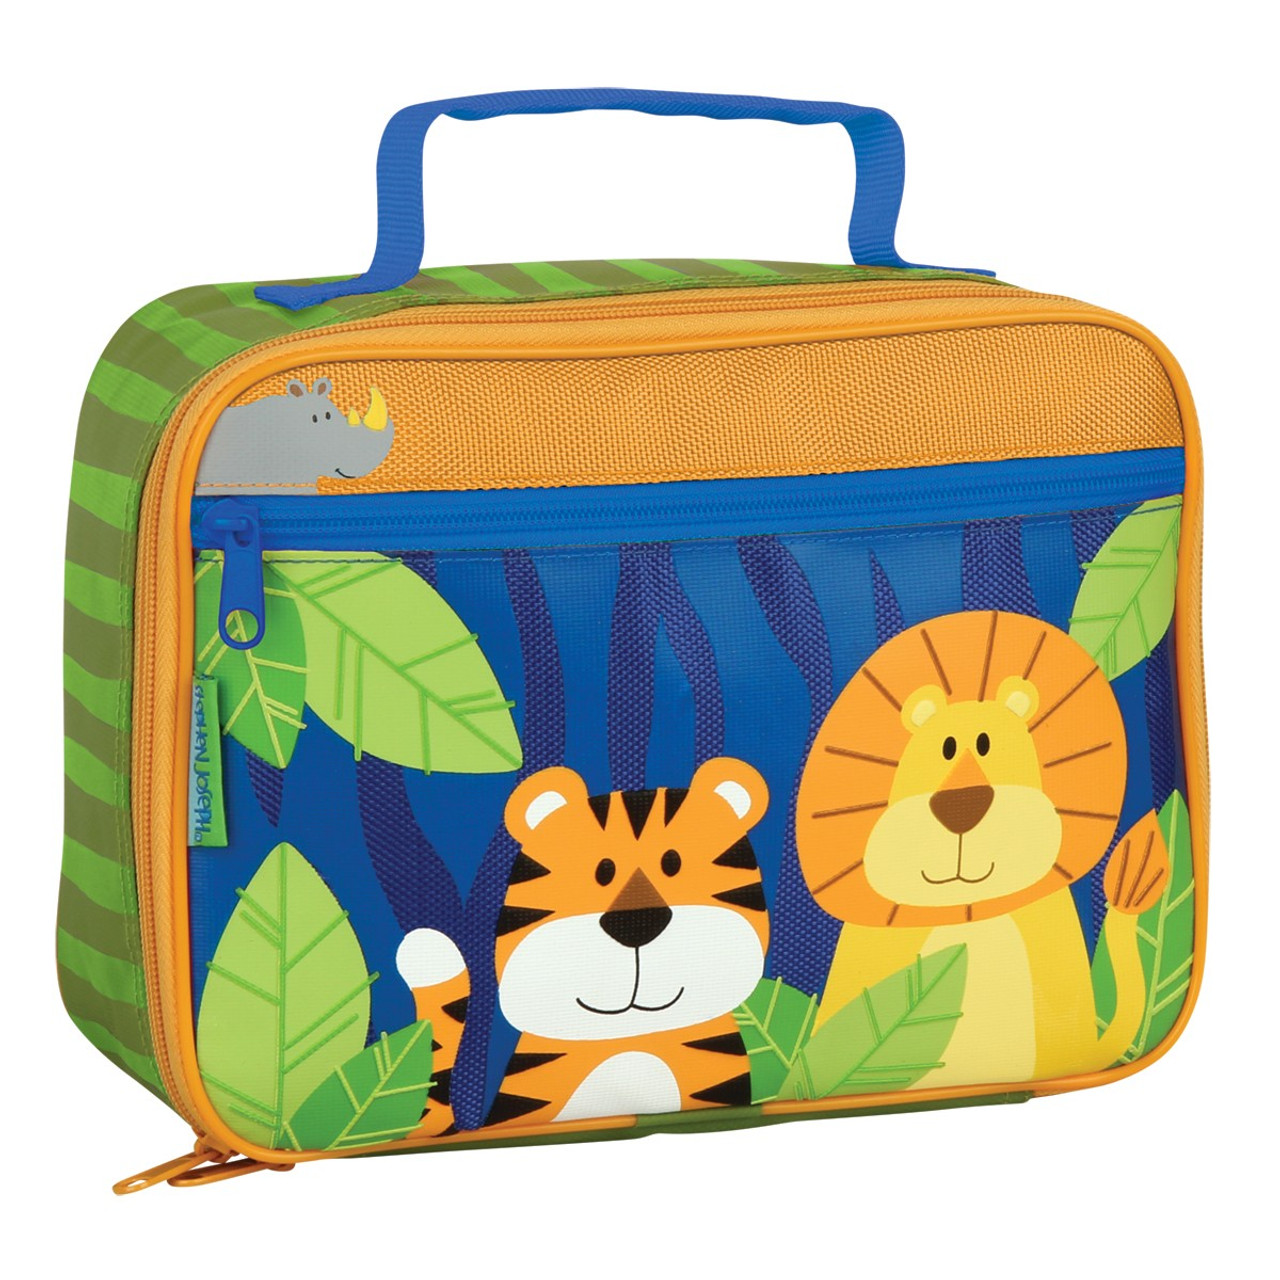 Boy Zoo Lunch Box - Stephen Joseph - Childrens Lunch Boxes 24dda4ef8